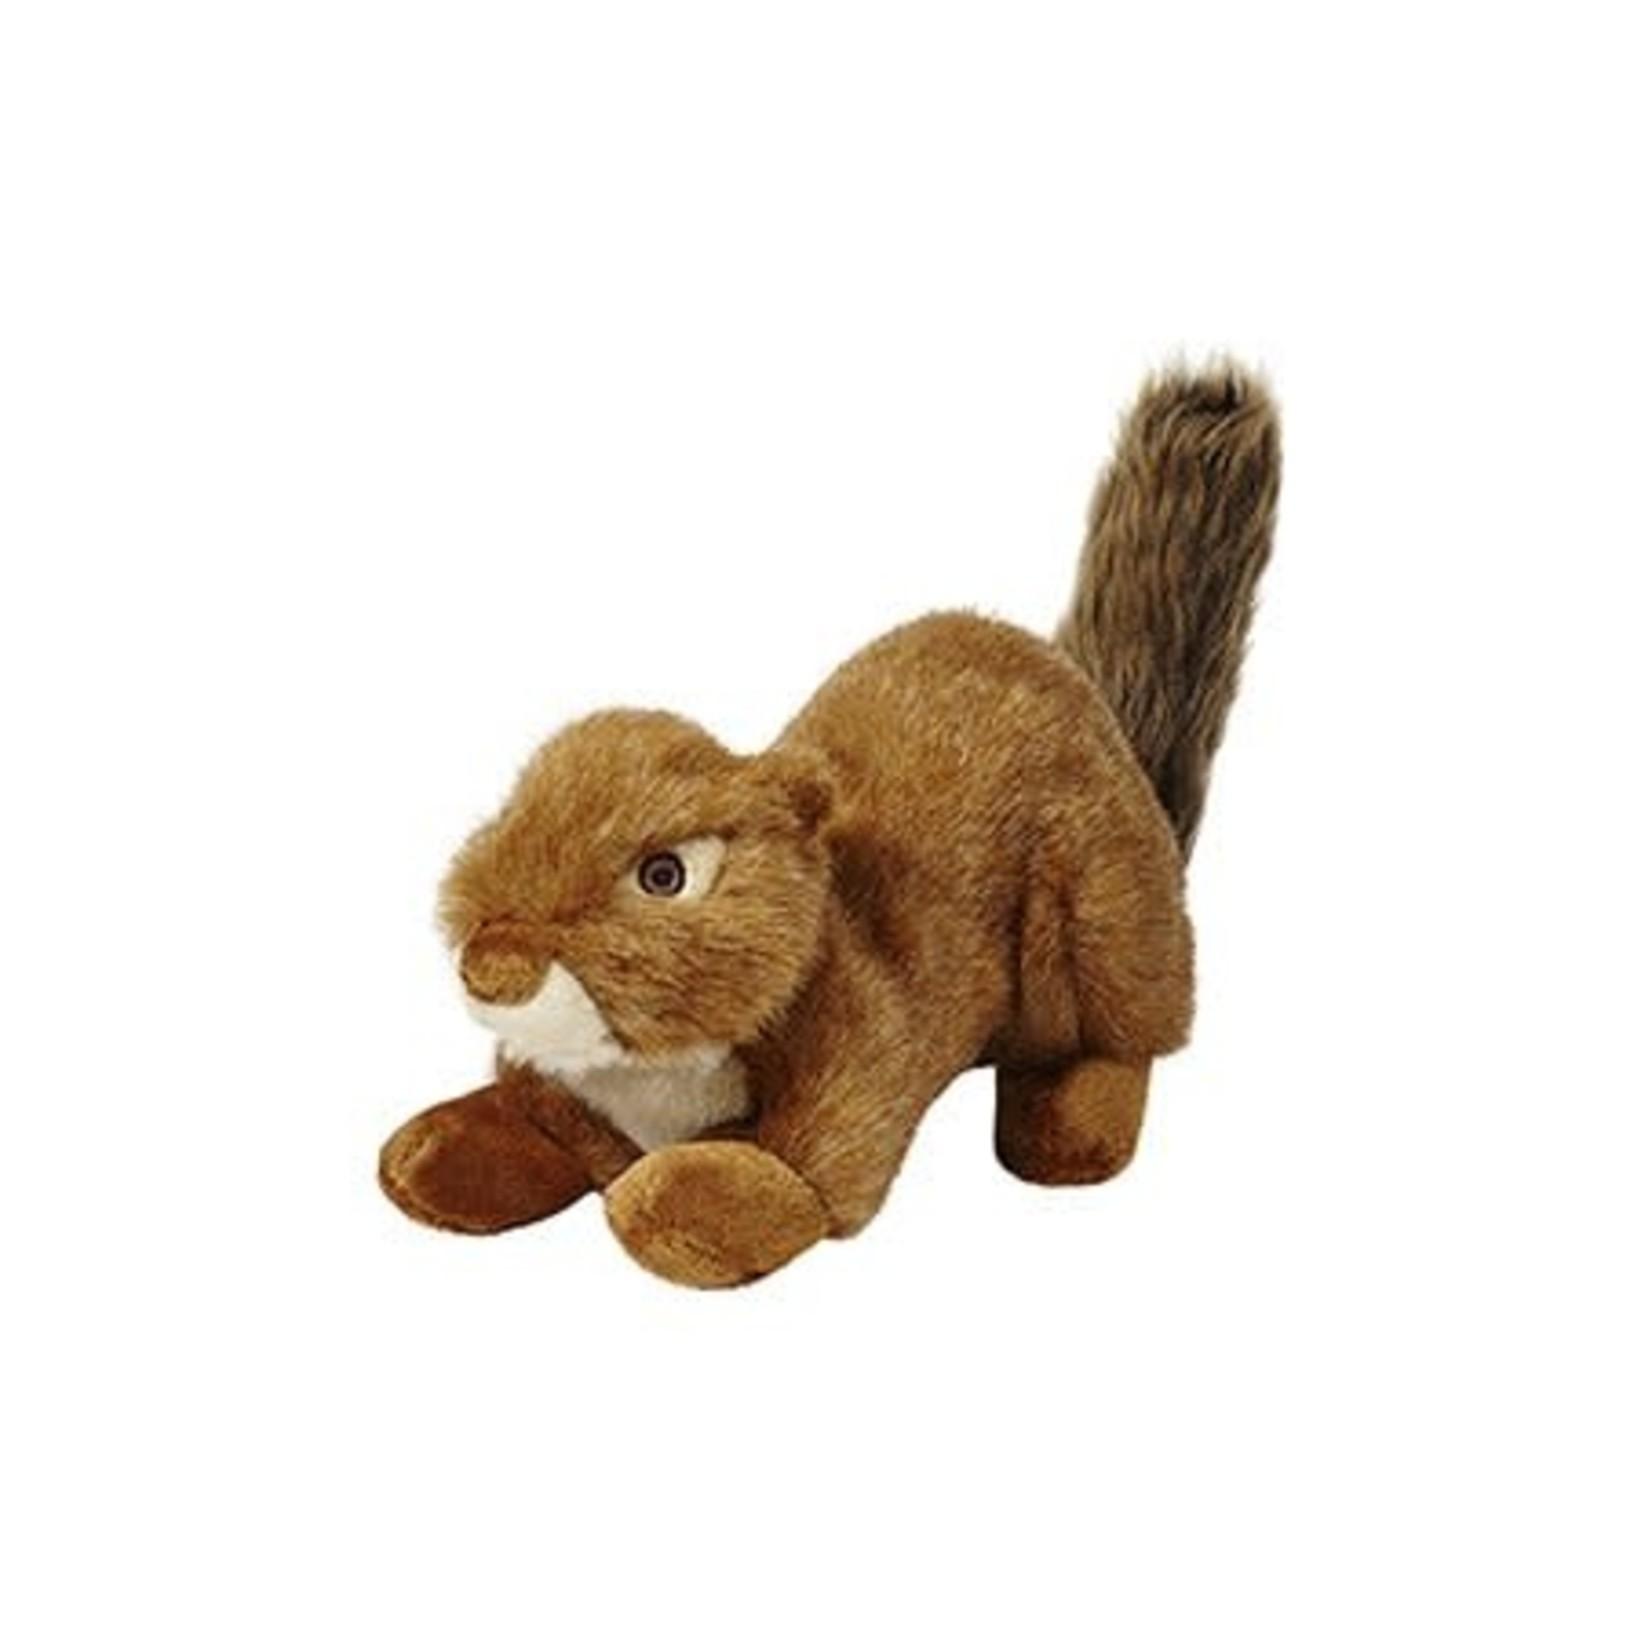 Fluff & Tuff Fluff & Tuff Red Squirrel Squeakerless Dog Toy Lrg